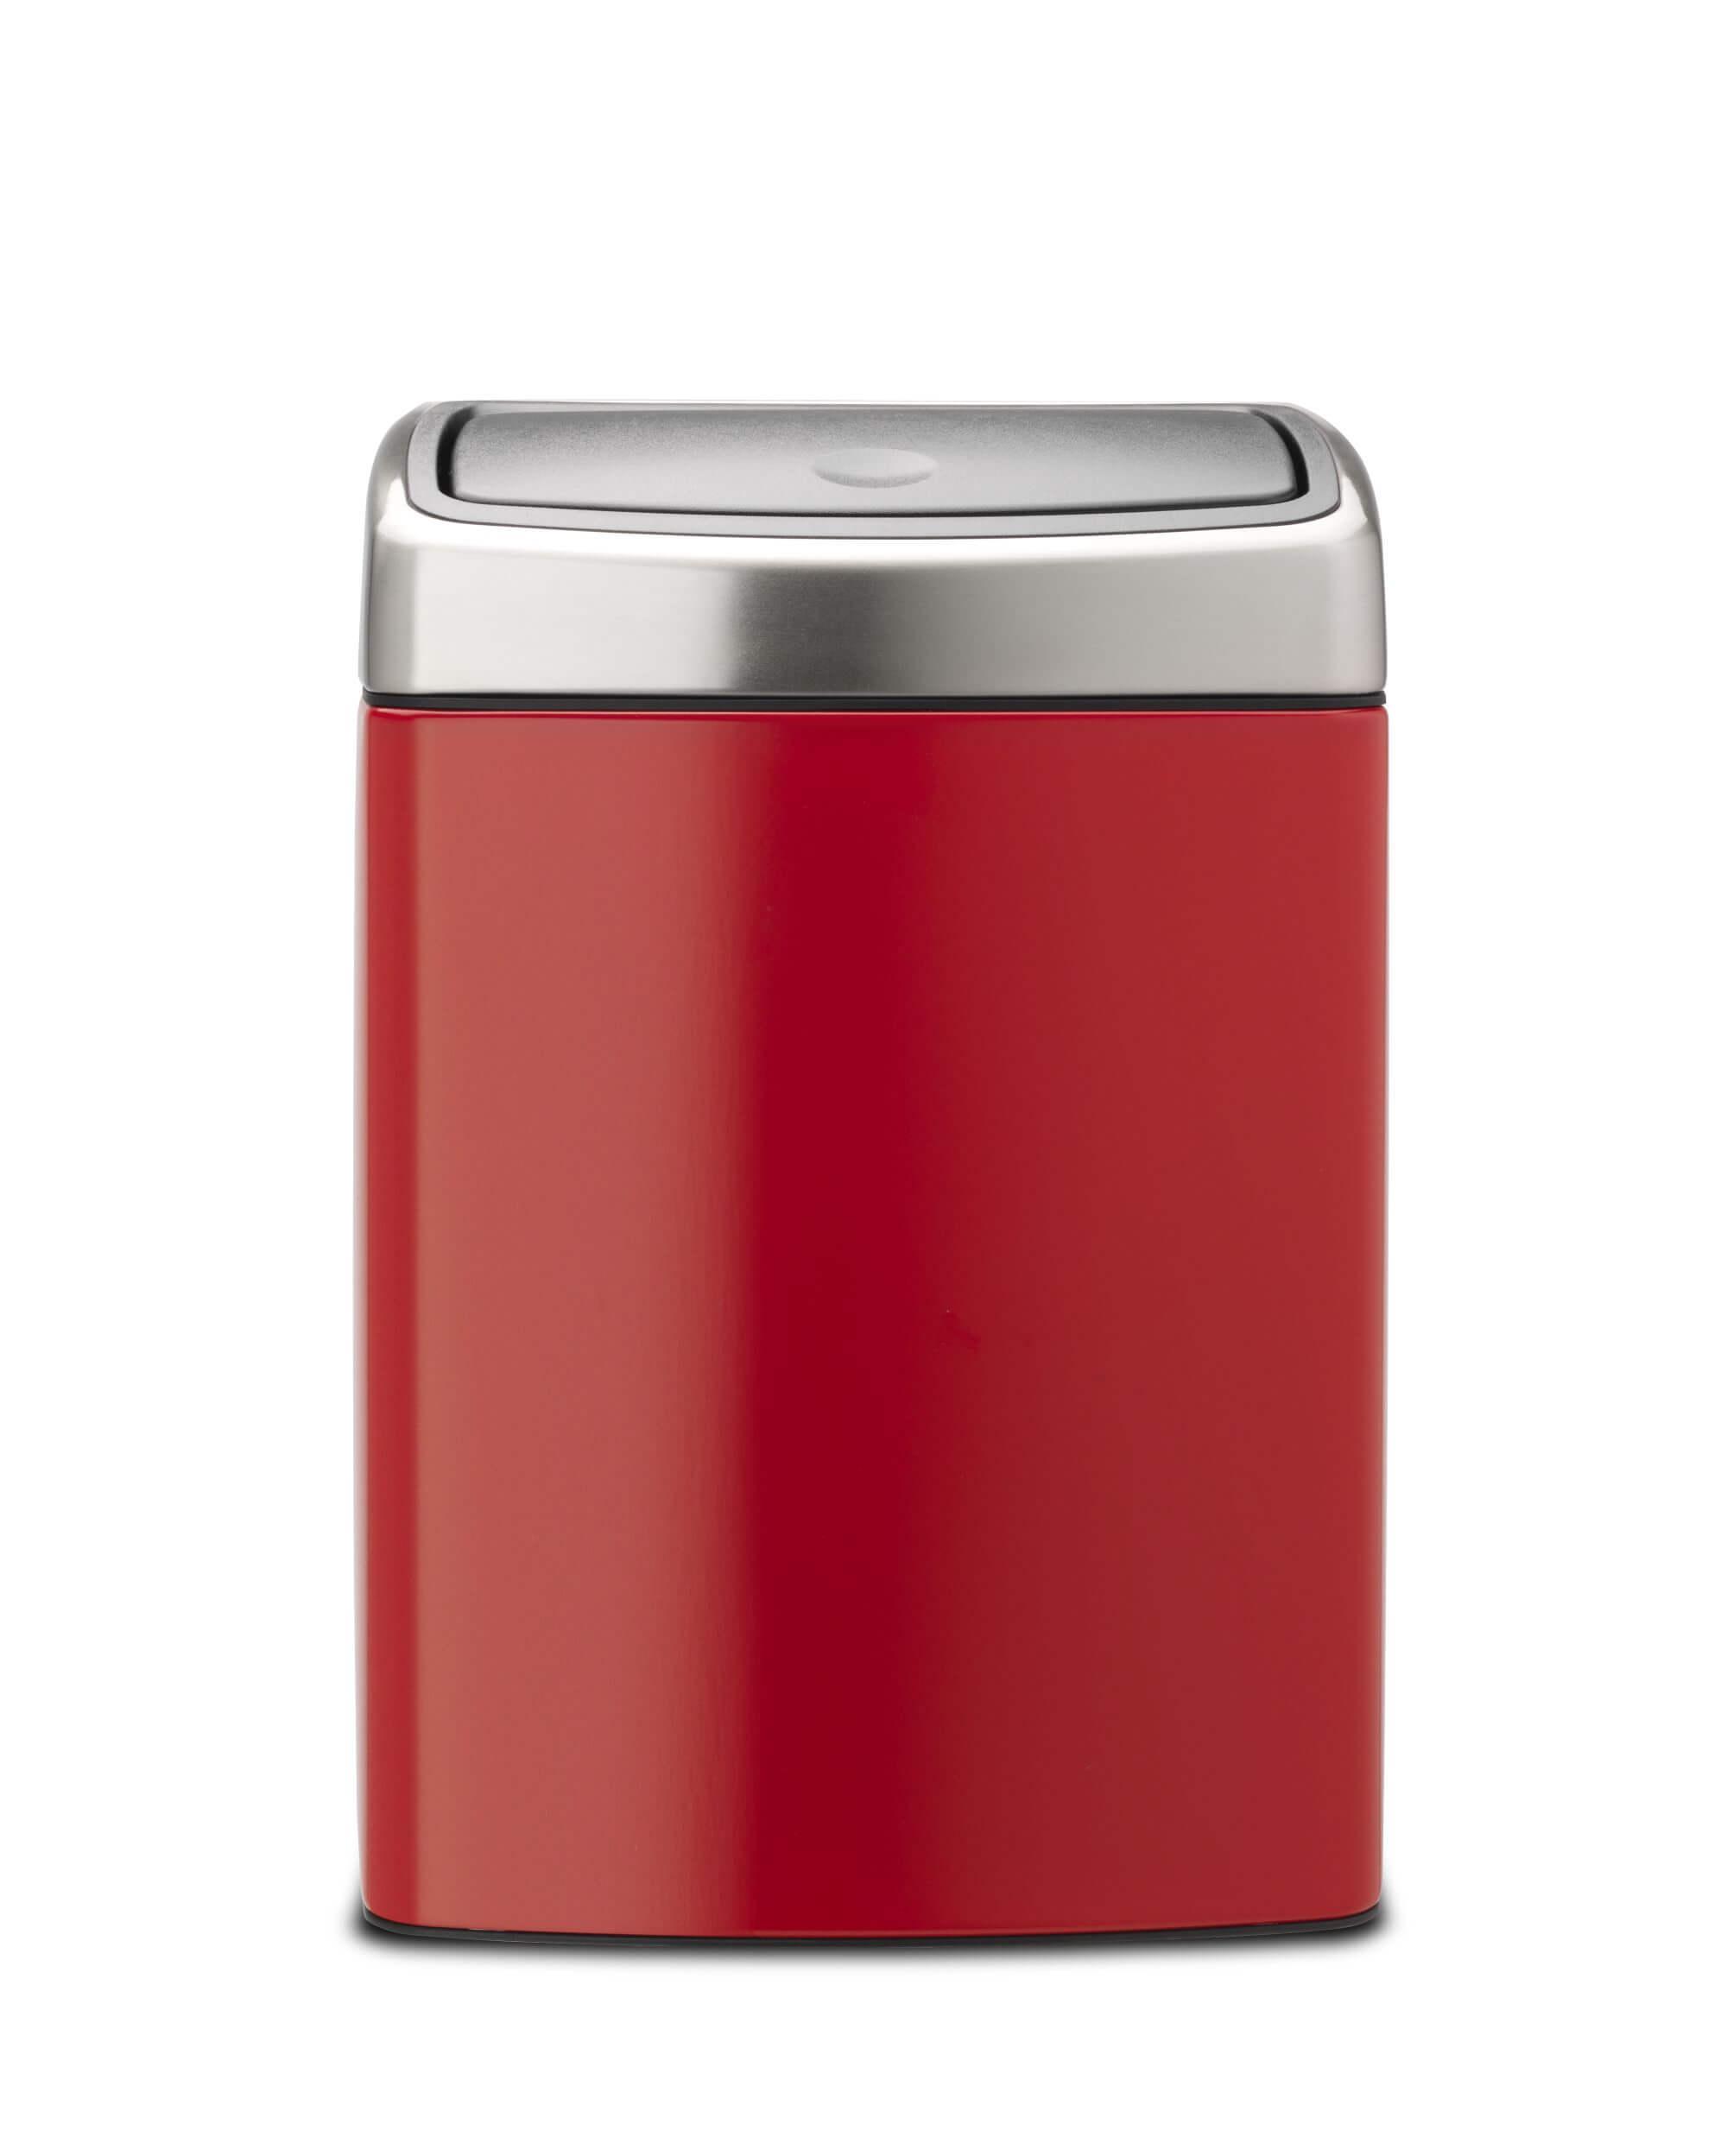 Pedaalemmer Brabantia 10 Liter.Brabantia Touch Bin 10 Liter Passion Red Brabantia Touch Bin 10 Liter Passion Red